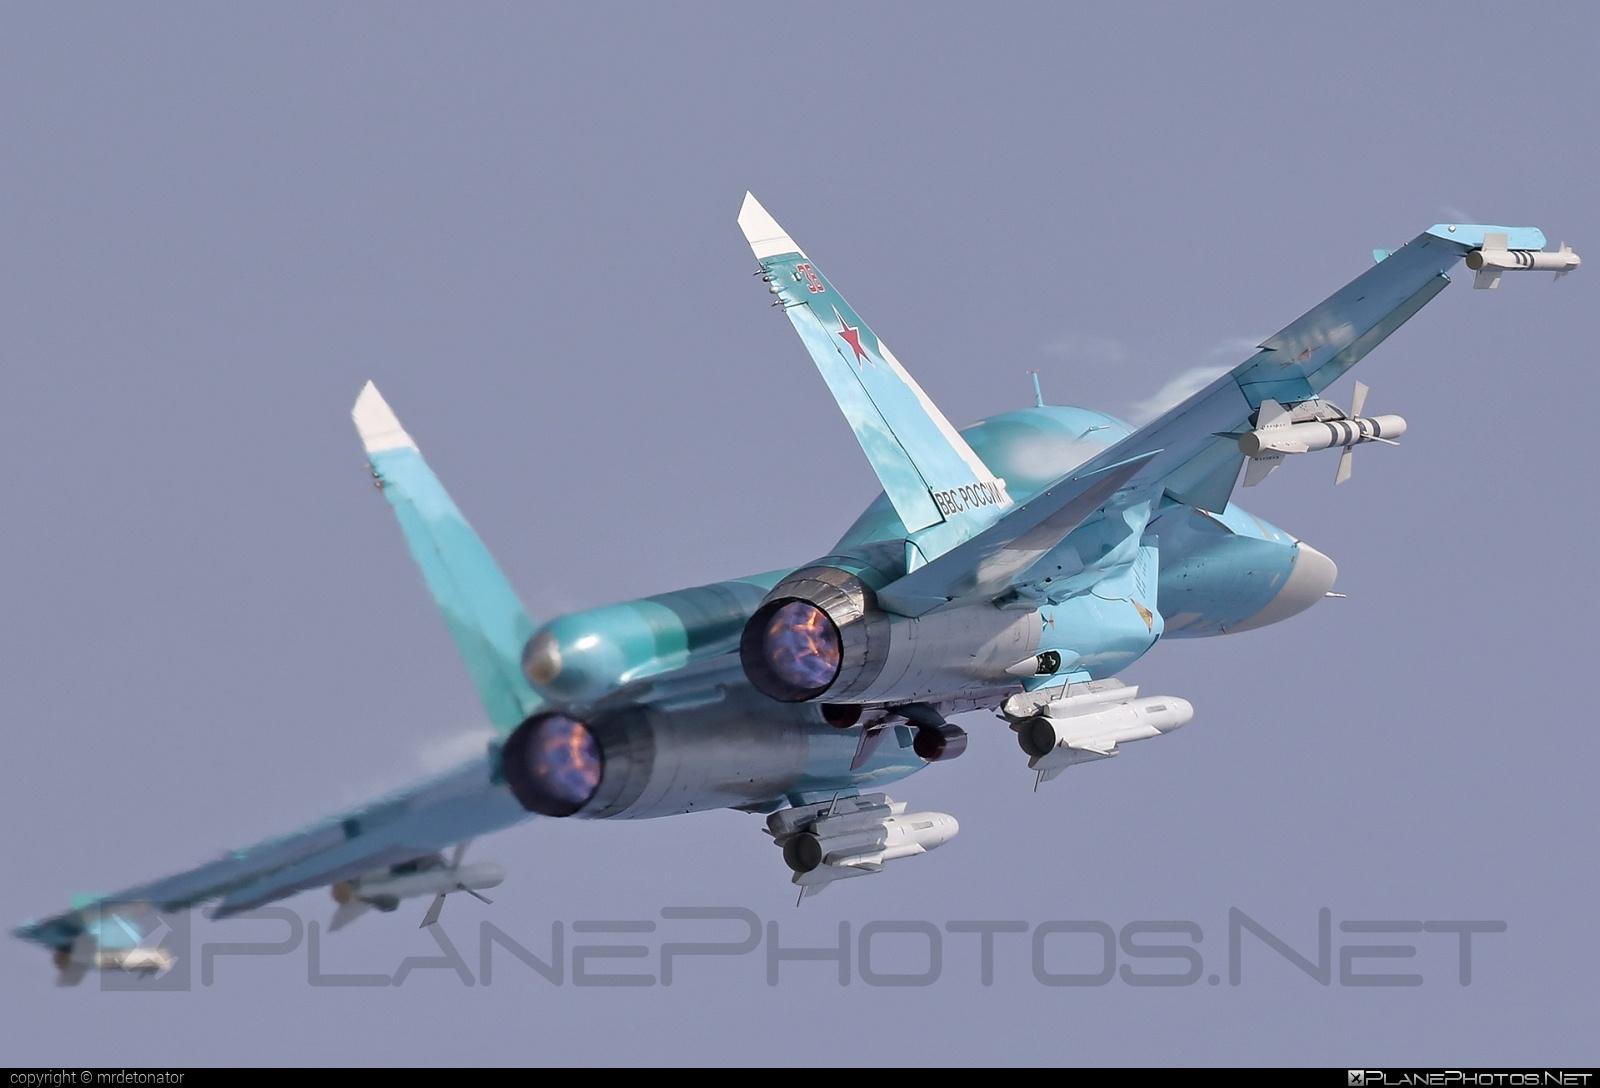 Sukhoi Su-34 - 38 operated by Voyenno-vozdushnye sily Rossii (Russian Air Force) #su34 #sukhoi #sukhoi34 #sukhoisu34